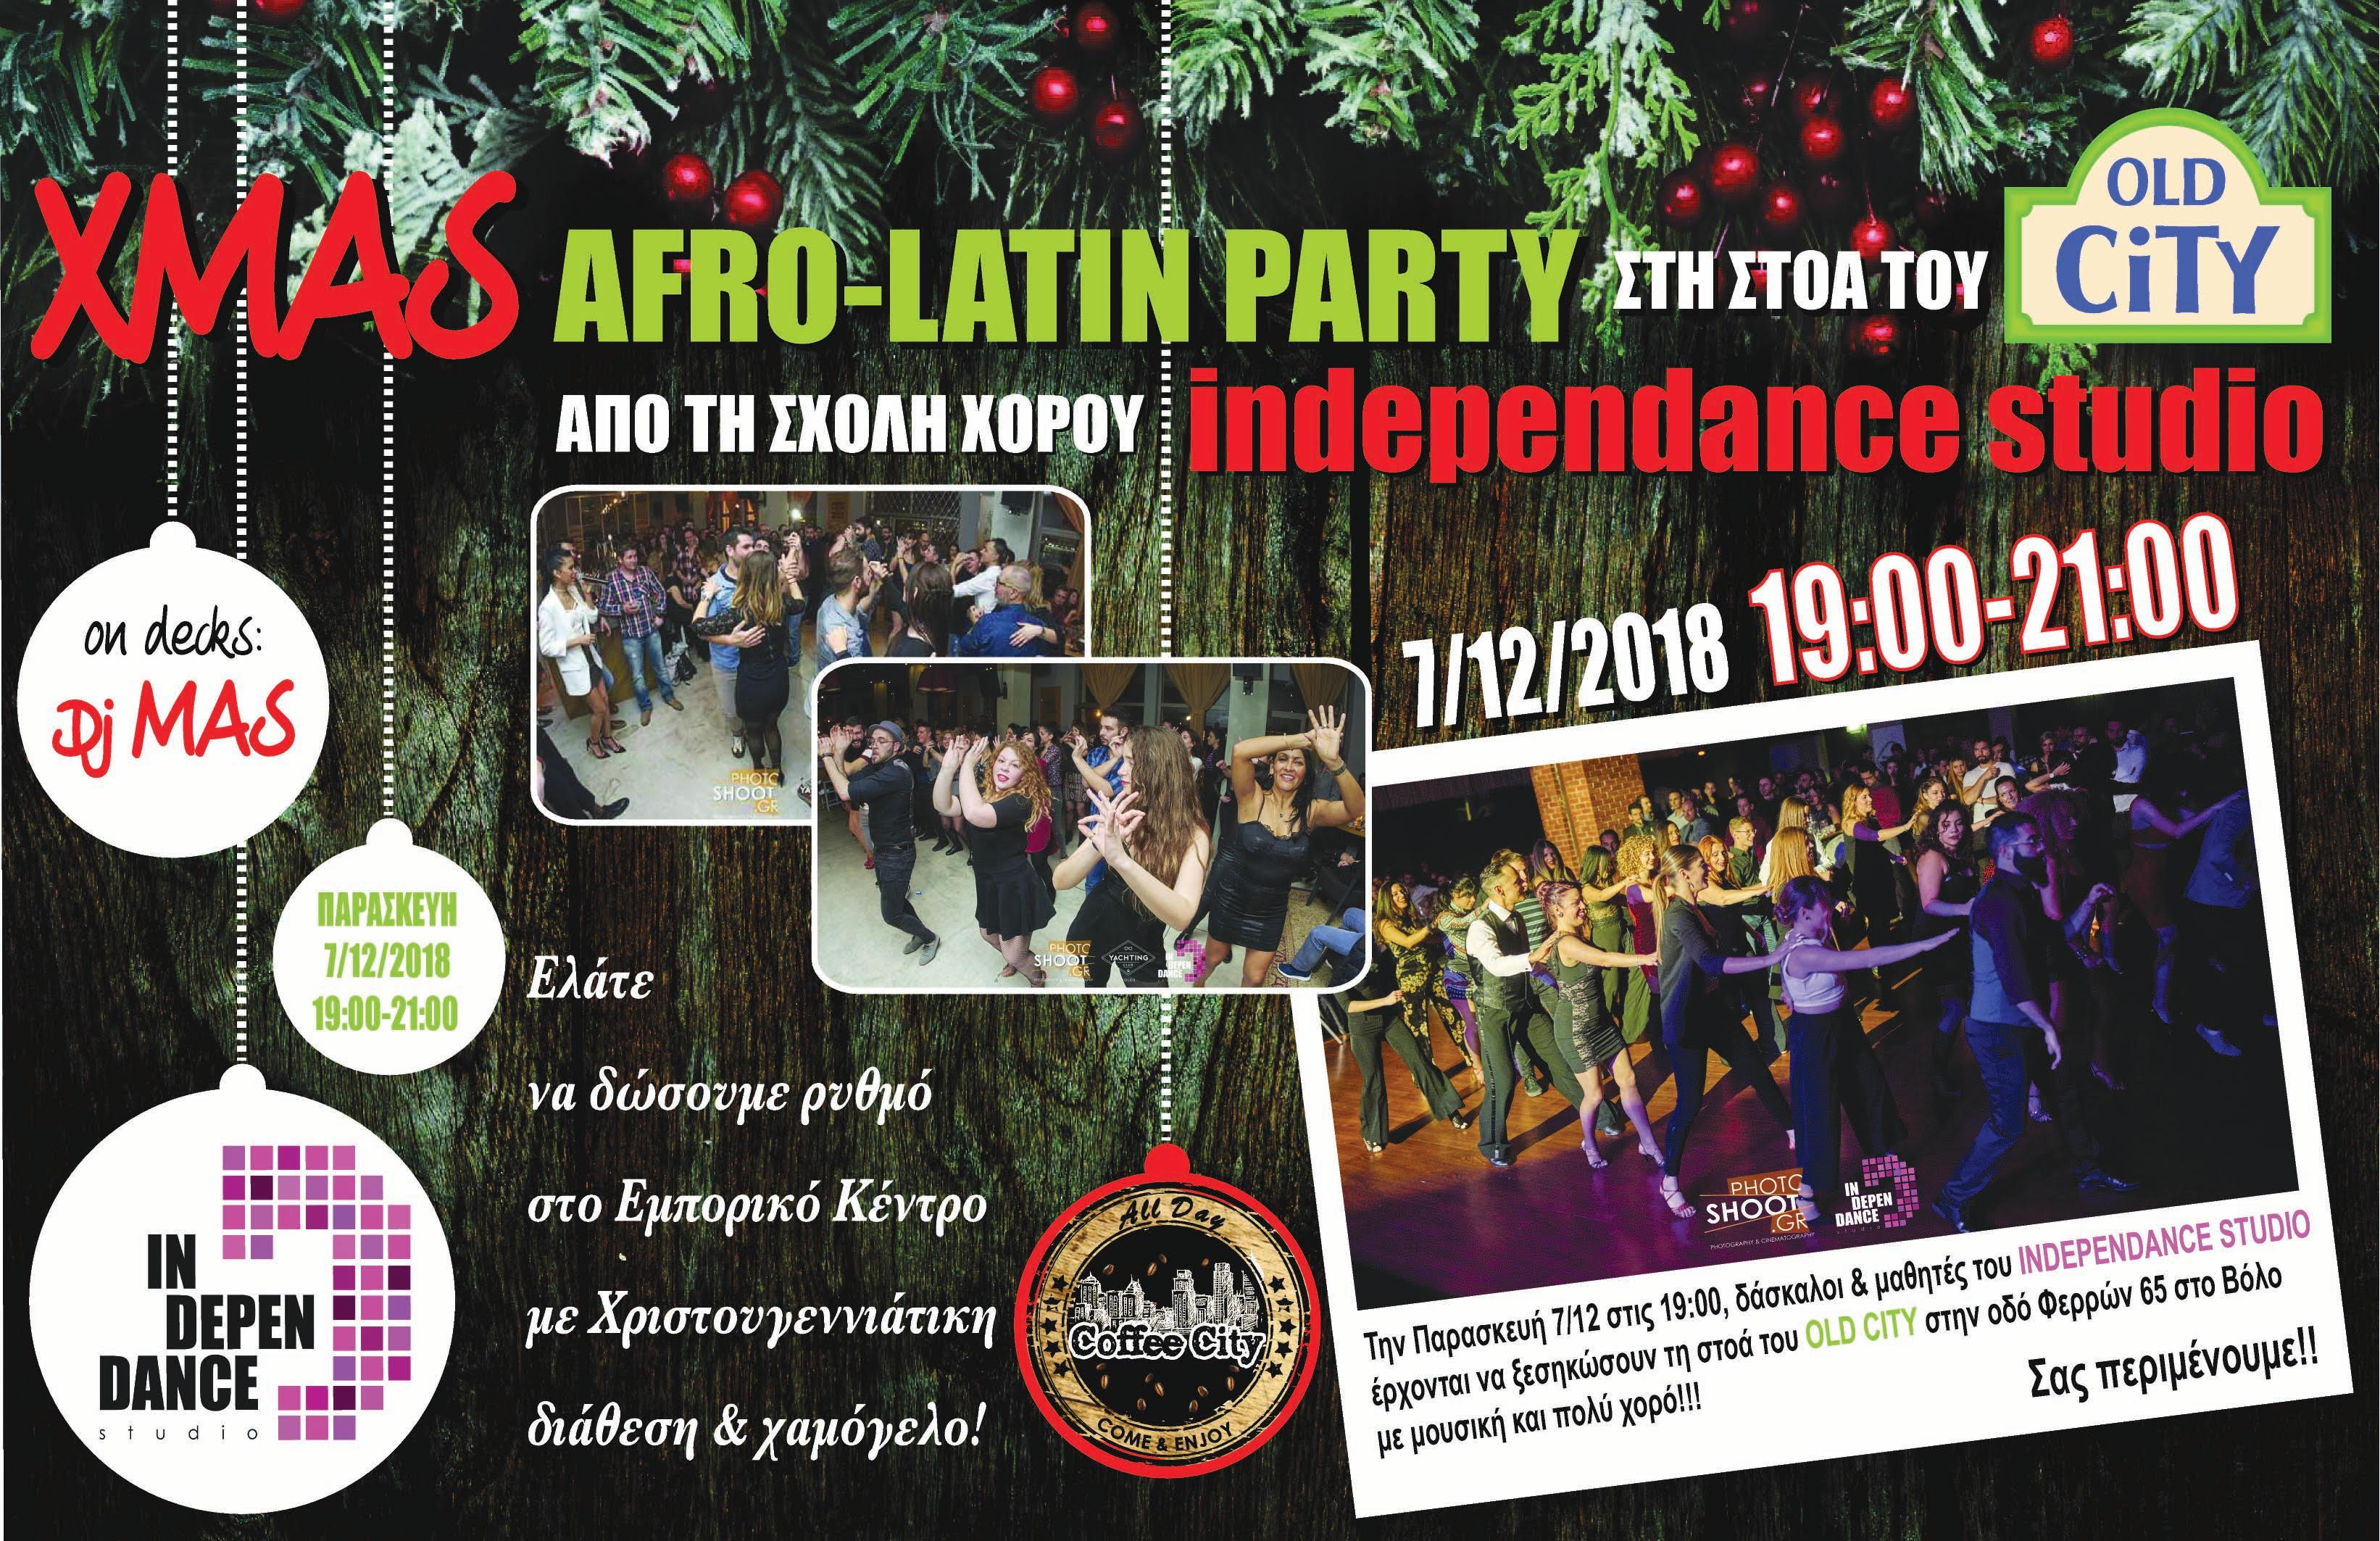 XMAS AFROLATIN PARTY στη στοά του Old City από τη σχολή χορού INDEPENDANCE STUDIO!